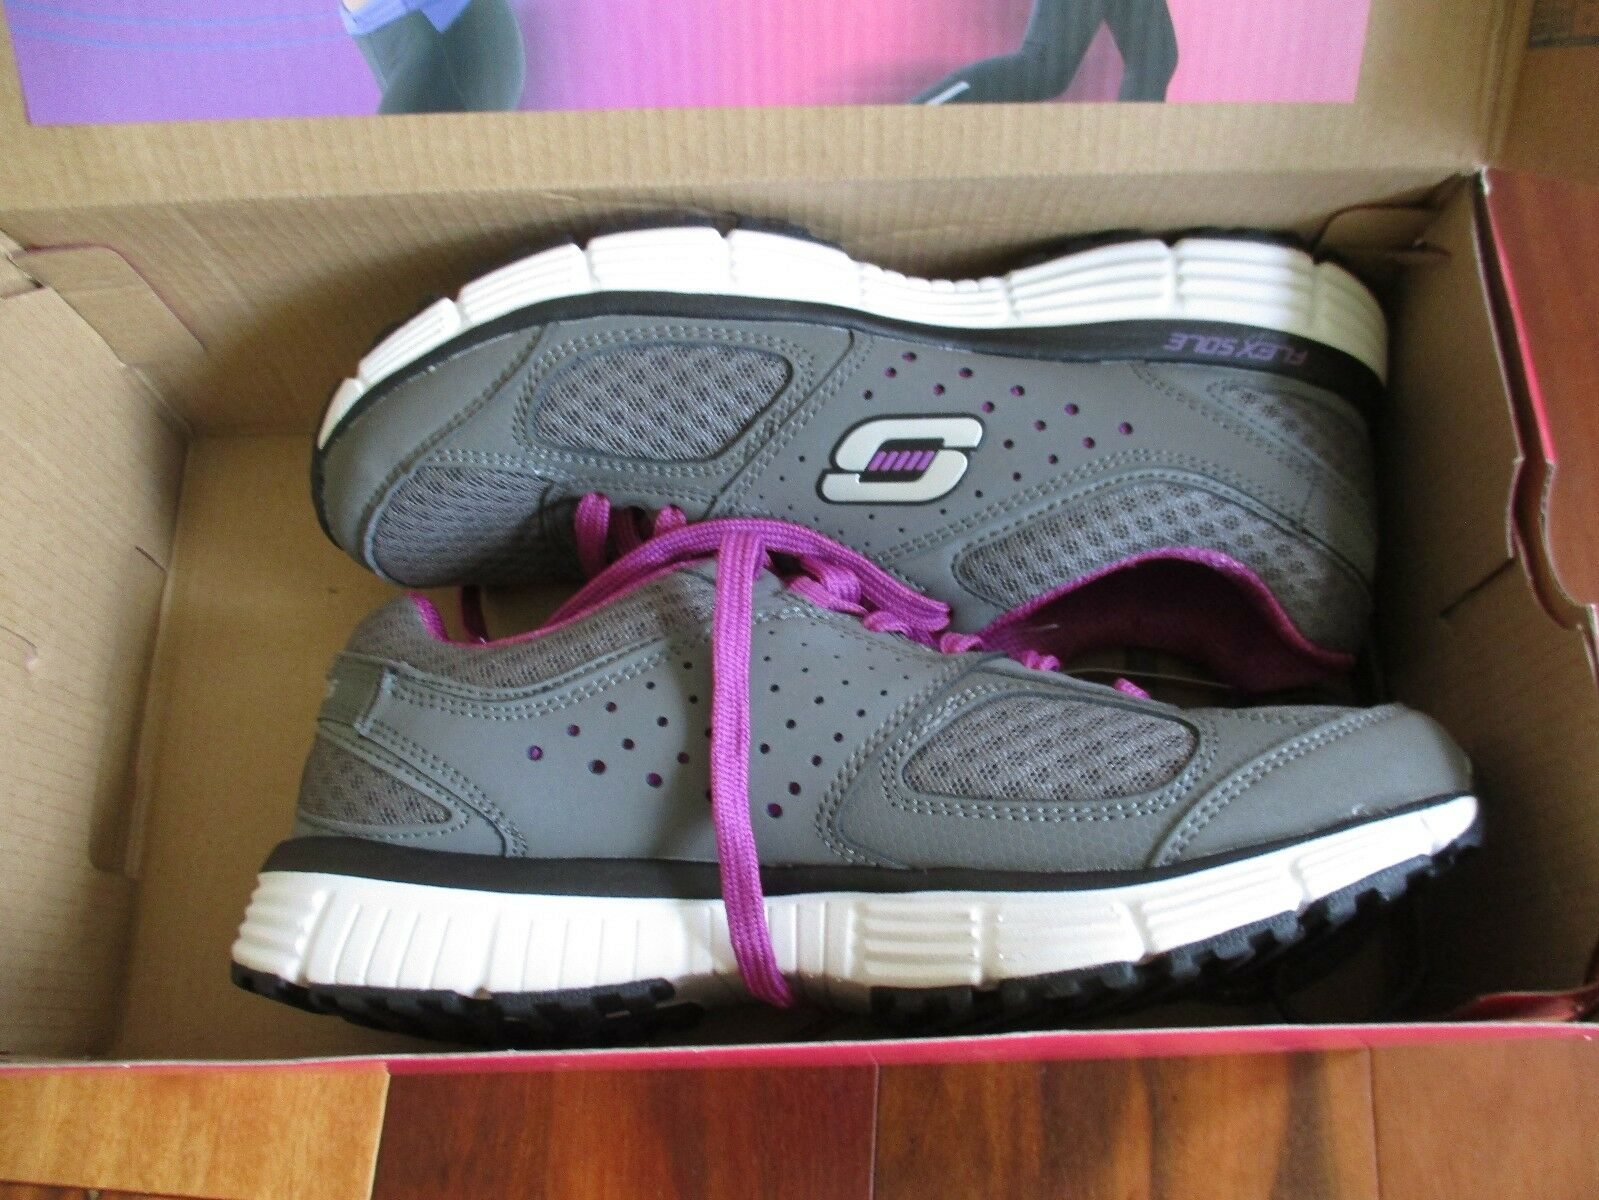 BNIB Skechers Perfect Fit femmes  Light weight running  Chaussures ,  Gris /purple